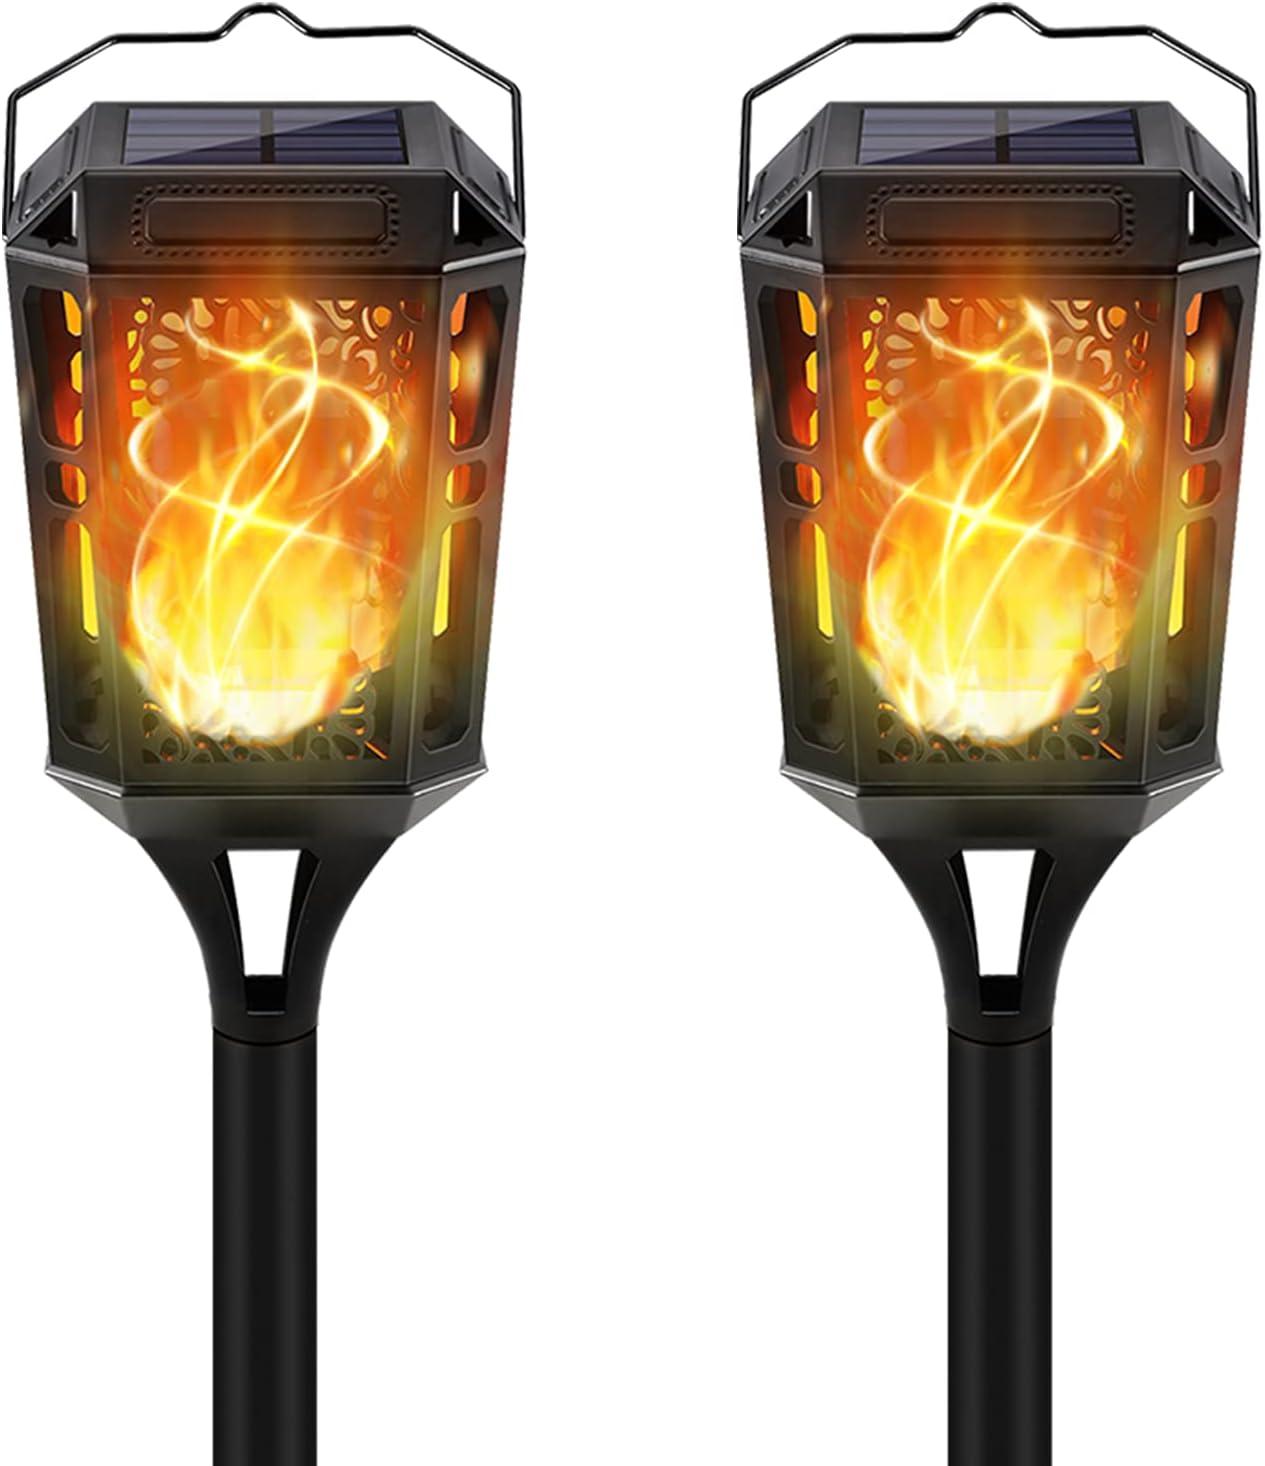 KYEKIO Detroit Mall Solar Lights Ranking TOP3 Outdoor Decorative Tiki 2Pack Torches